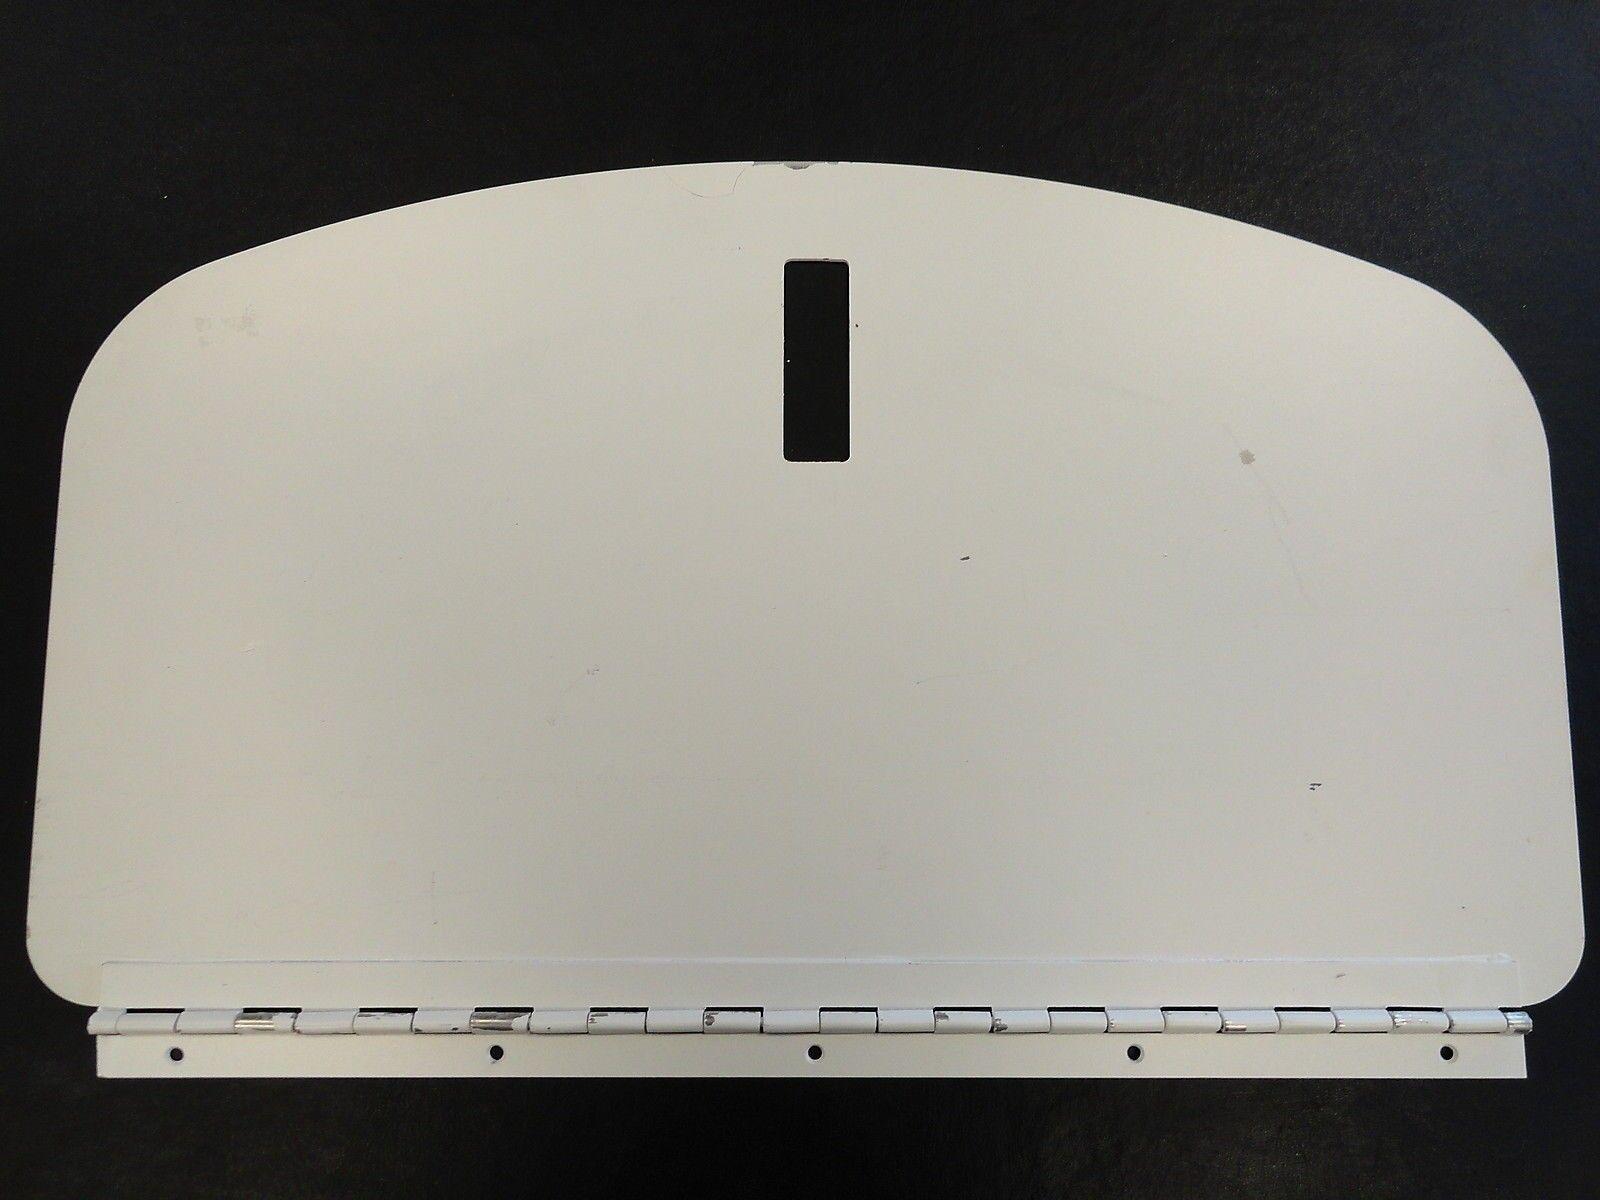 Buy powerquest aluminum off white grey glove box door 21 for United states aluminum corporation doors